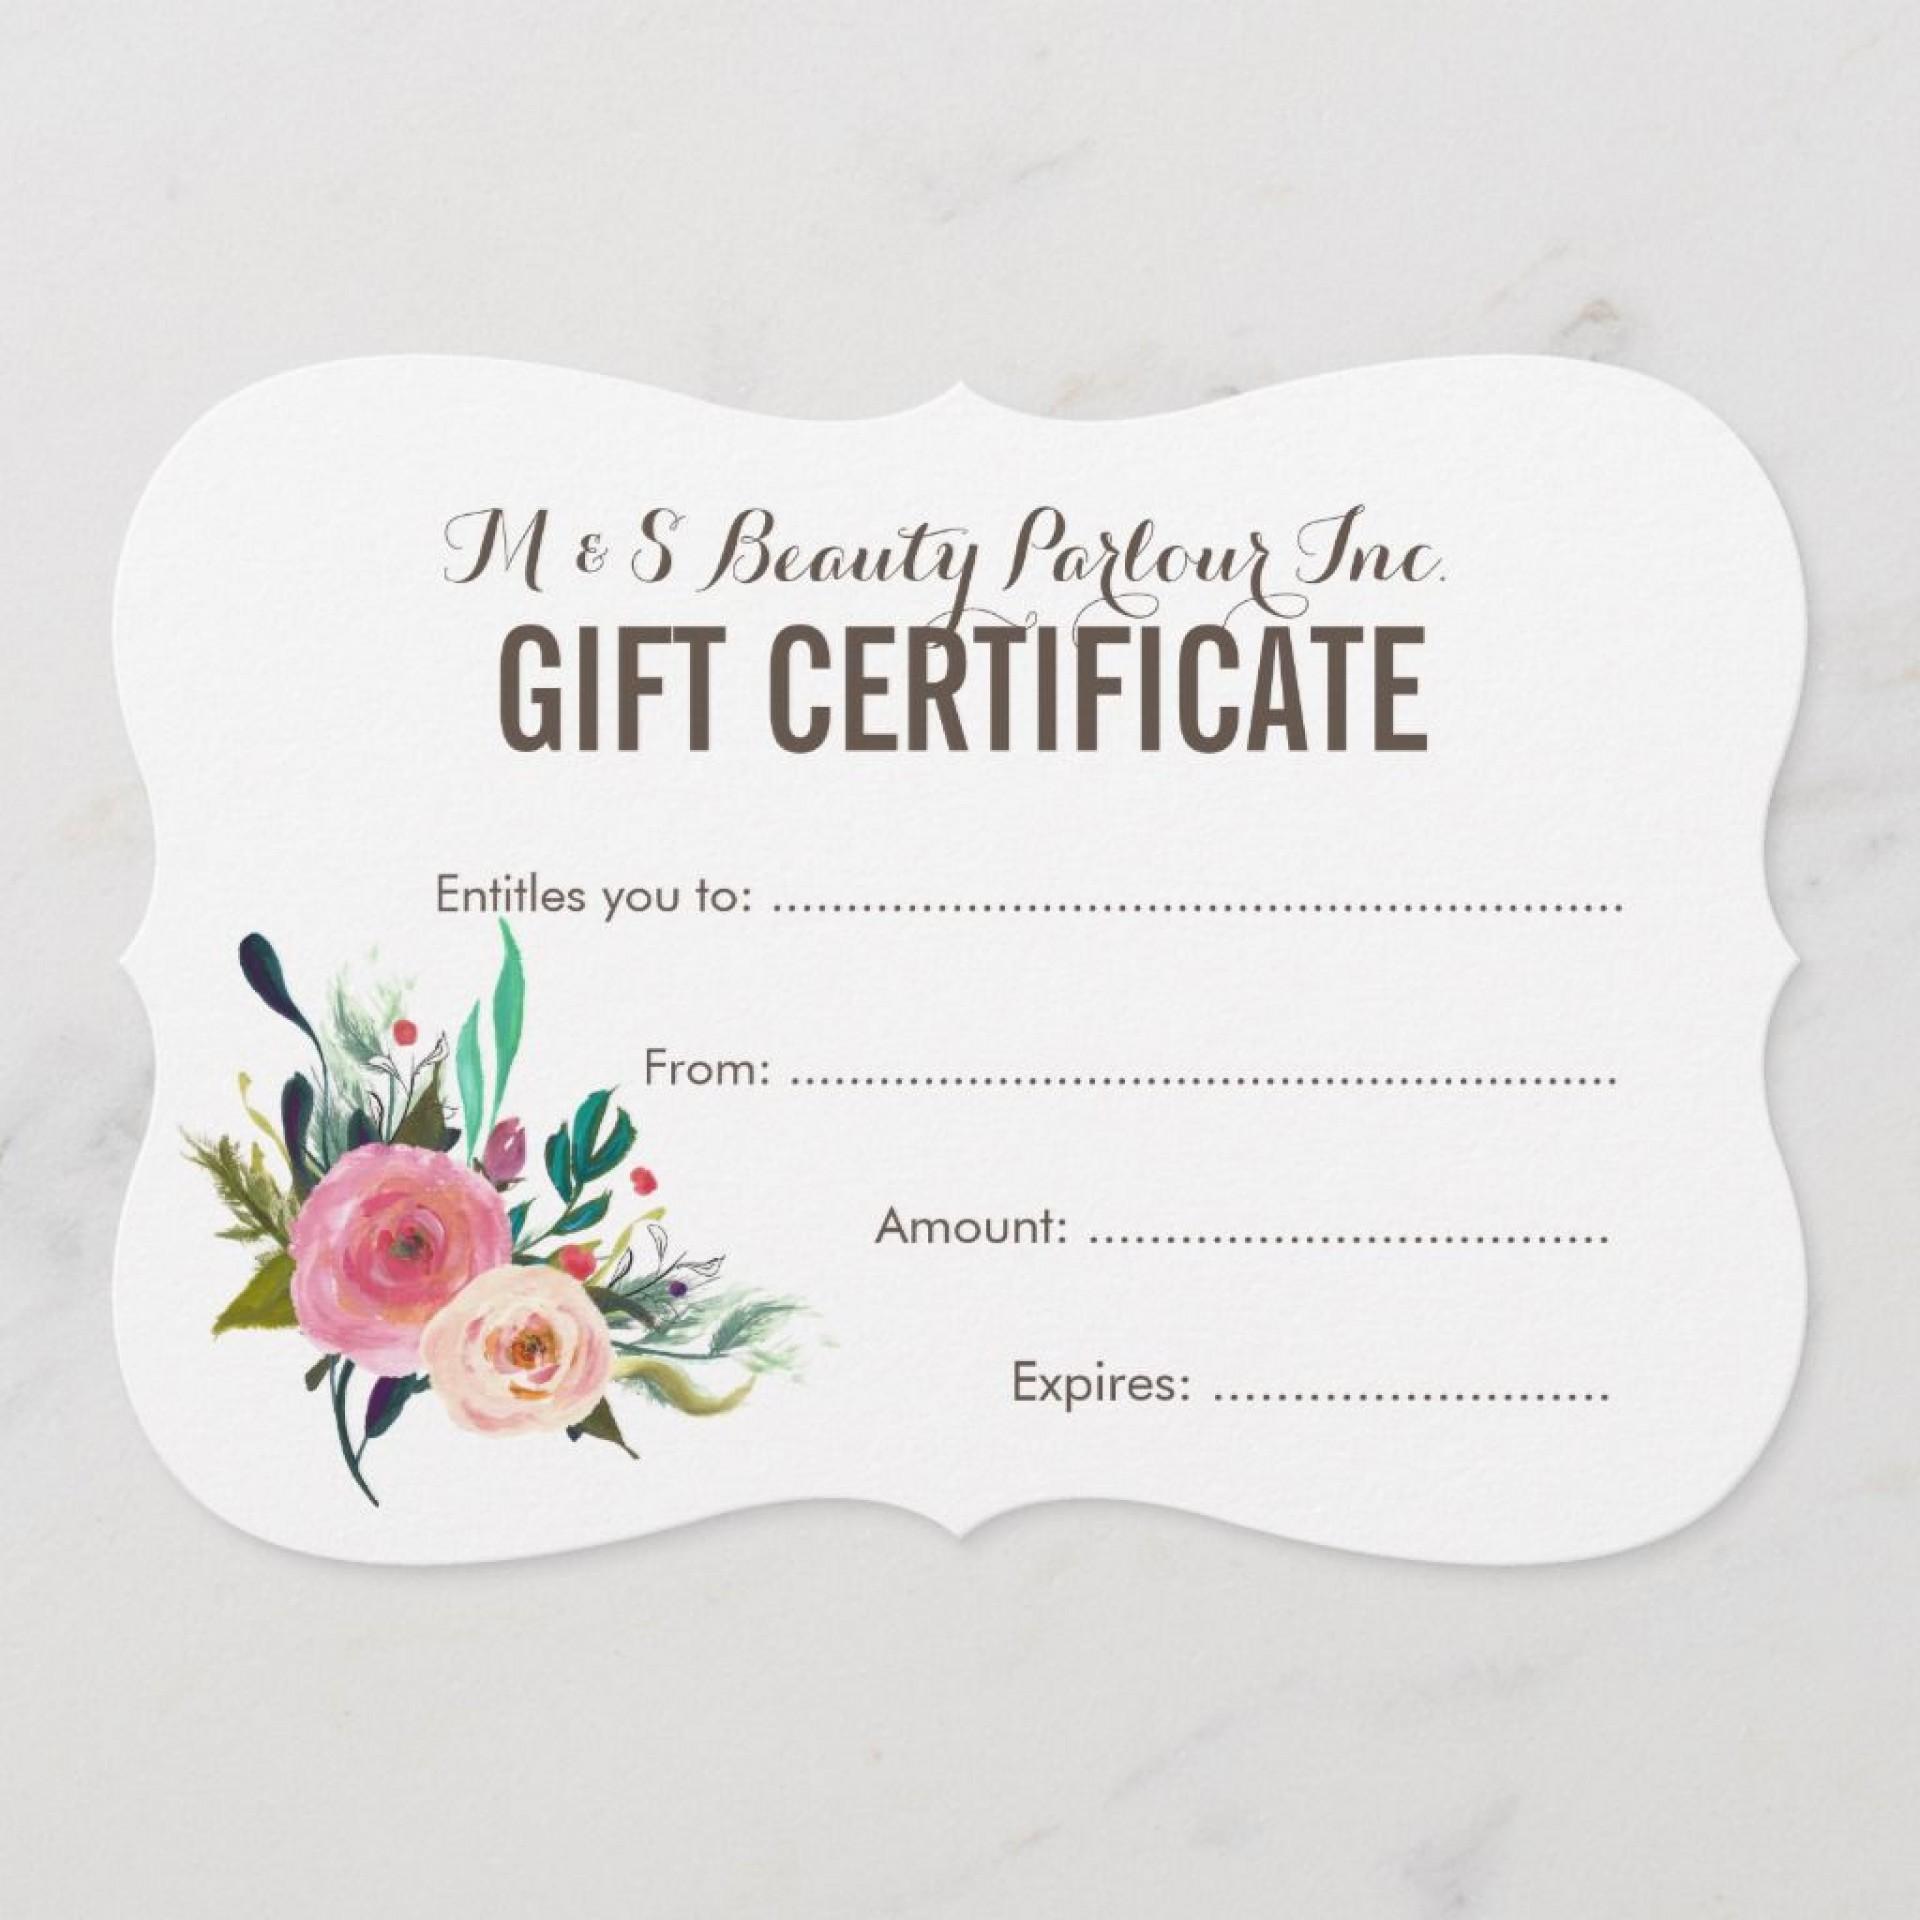 005 Best Salon Gift Certificate Template Photo  Templates1920